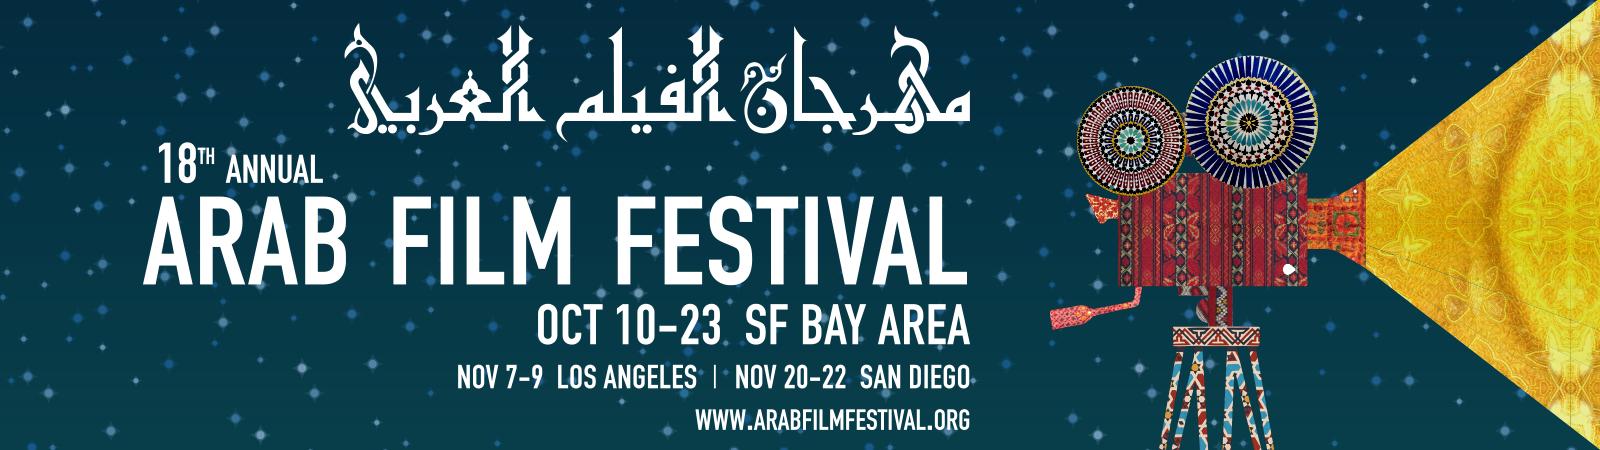 Arab Film Festival 2014